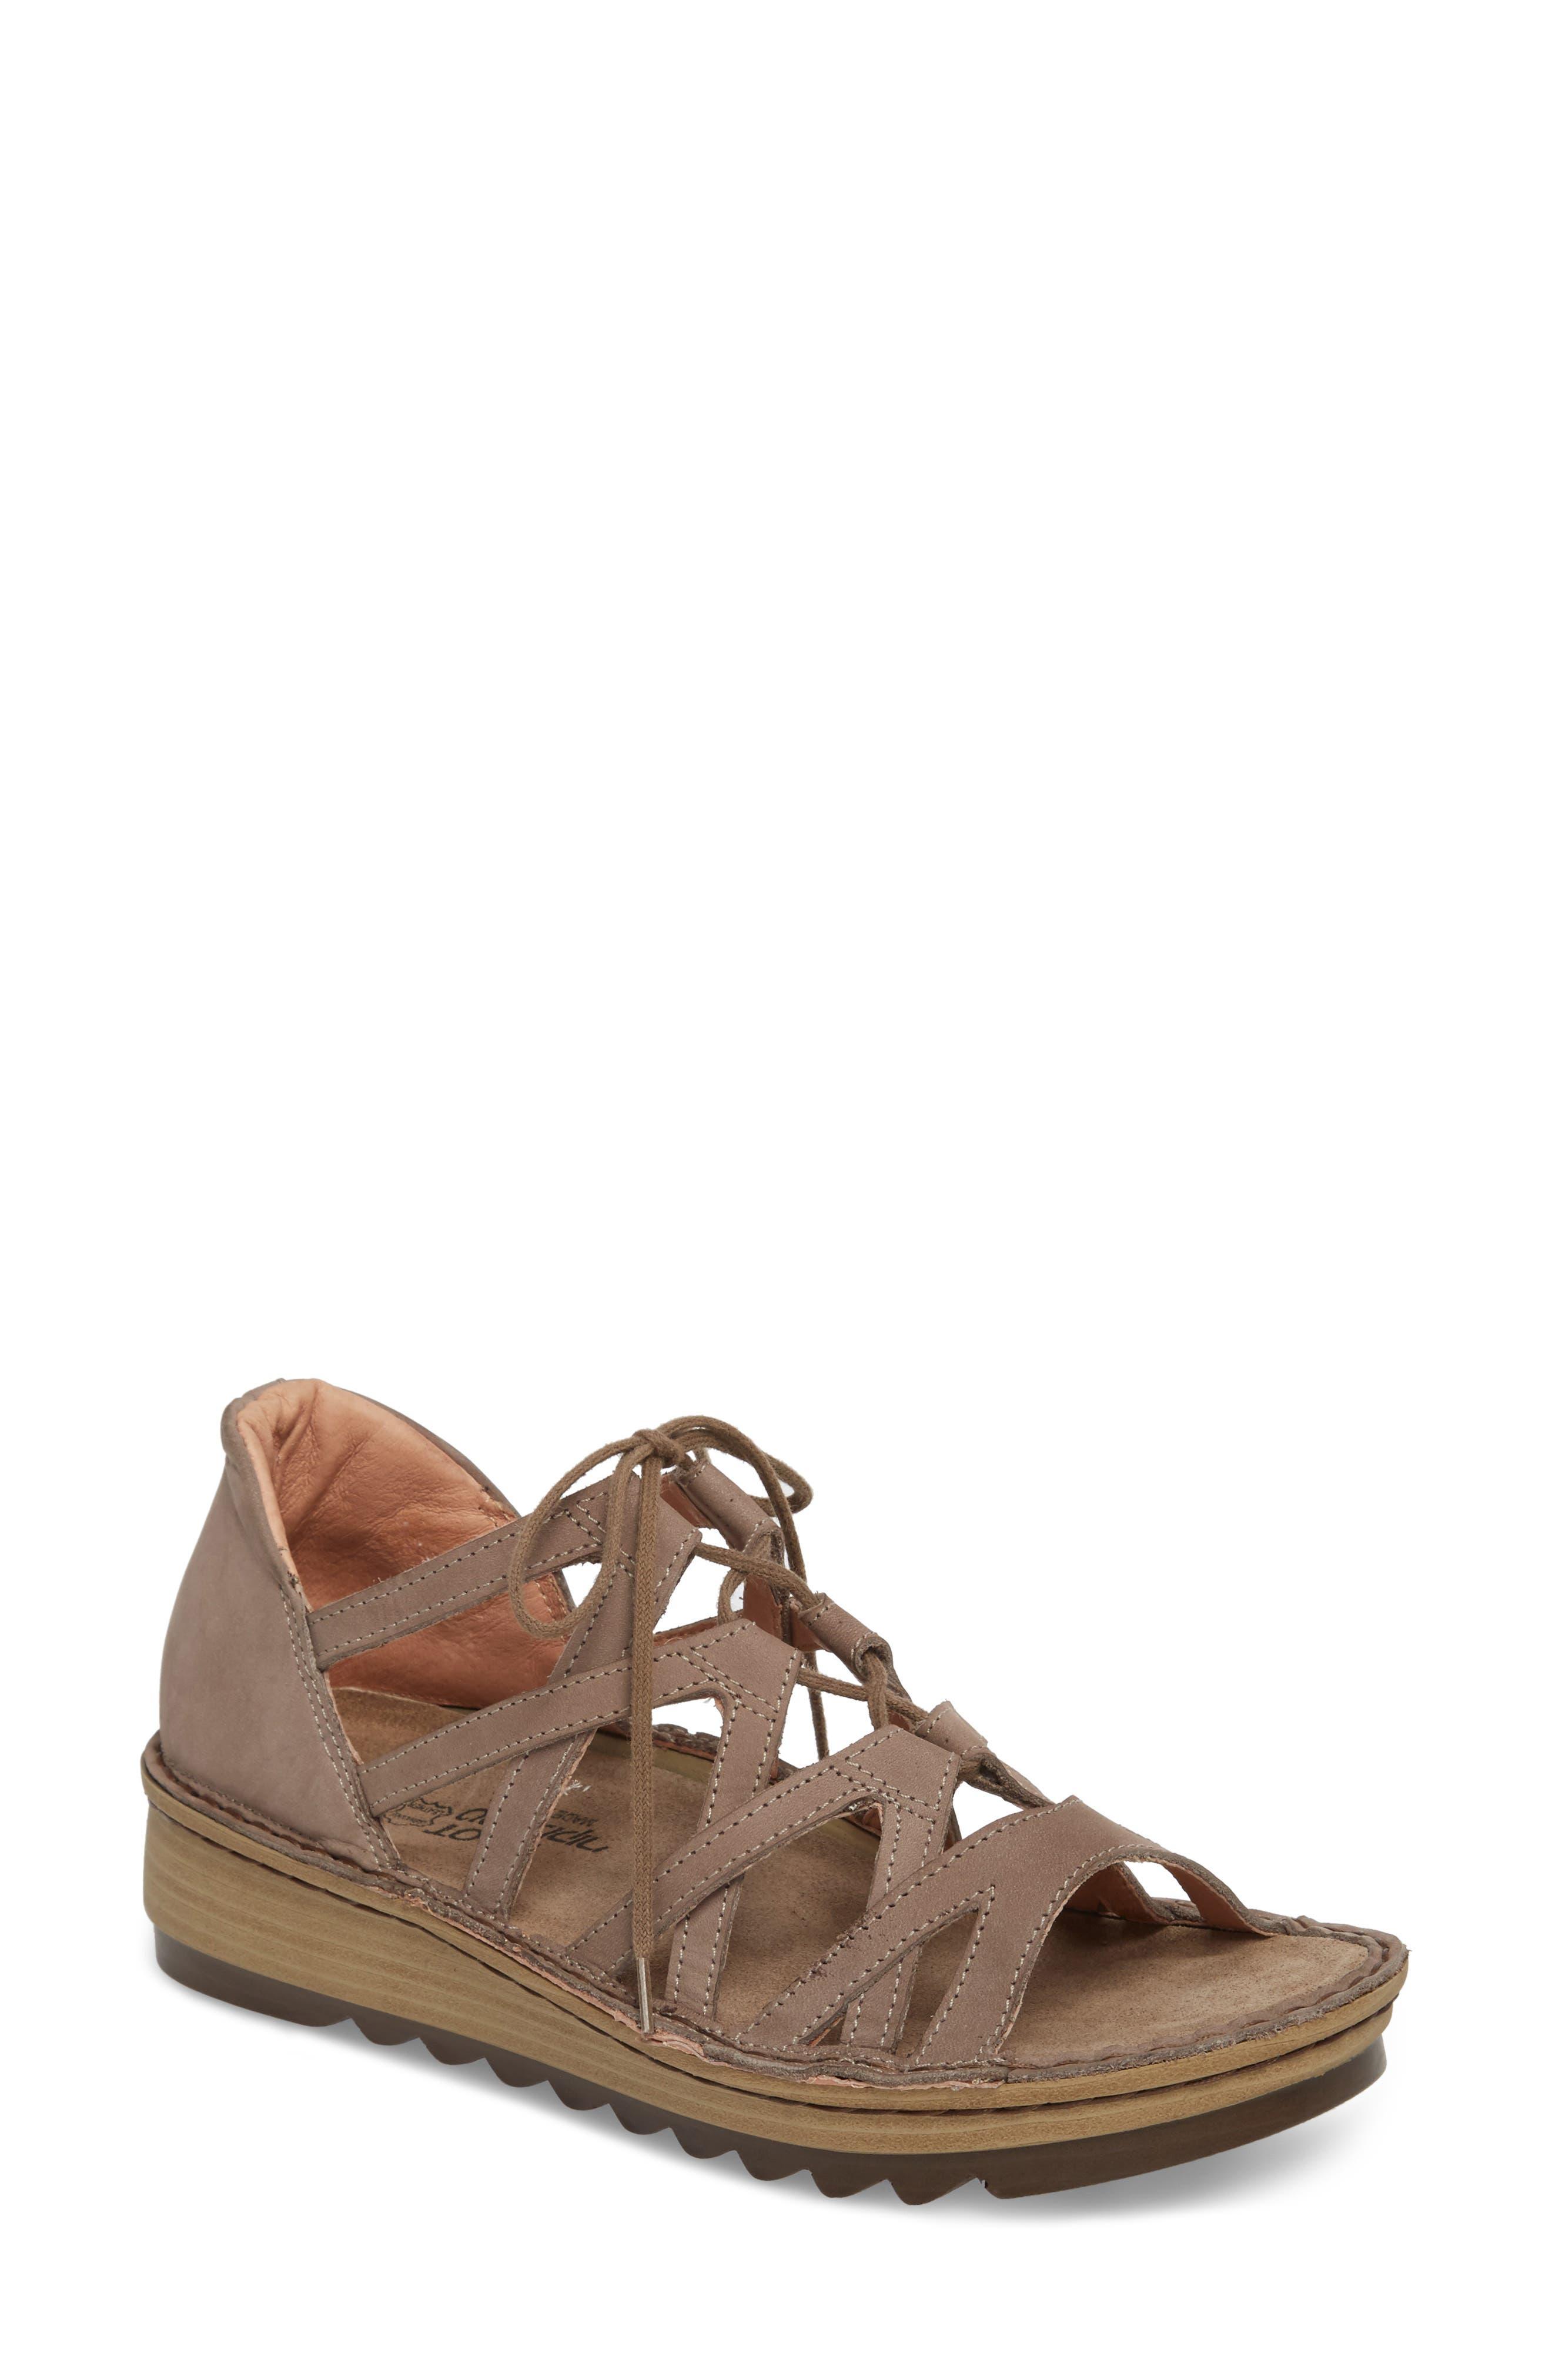 Yarrow Sandal,                         Main,                         color, STONE NUBUCK